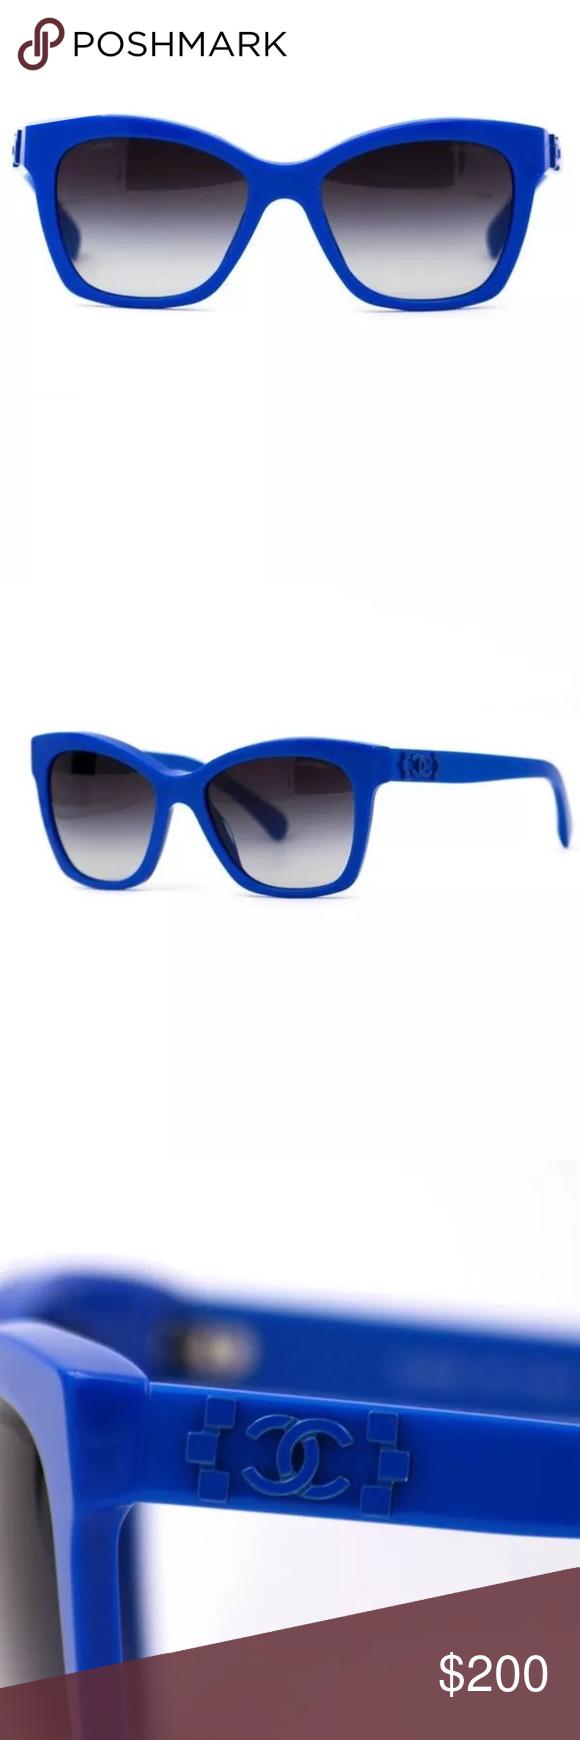 Chanel Sunglasses Blue CC Logo Pantos 5313 Chanel CC logo cat eye ...